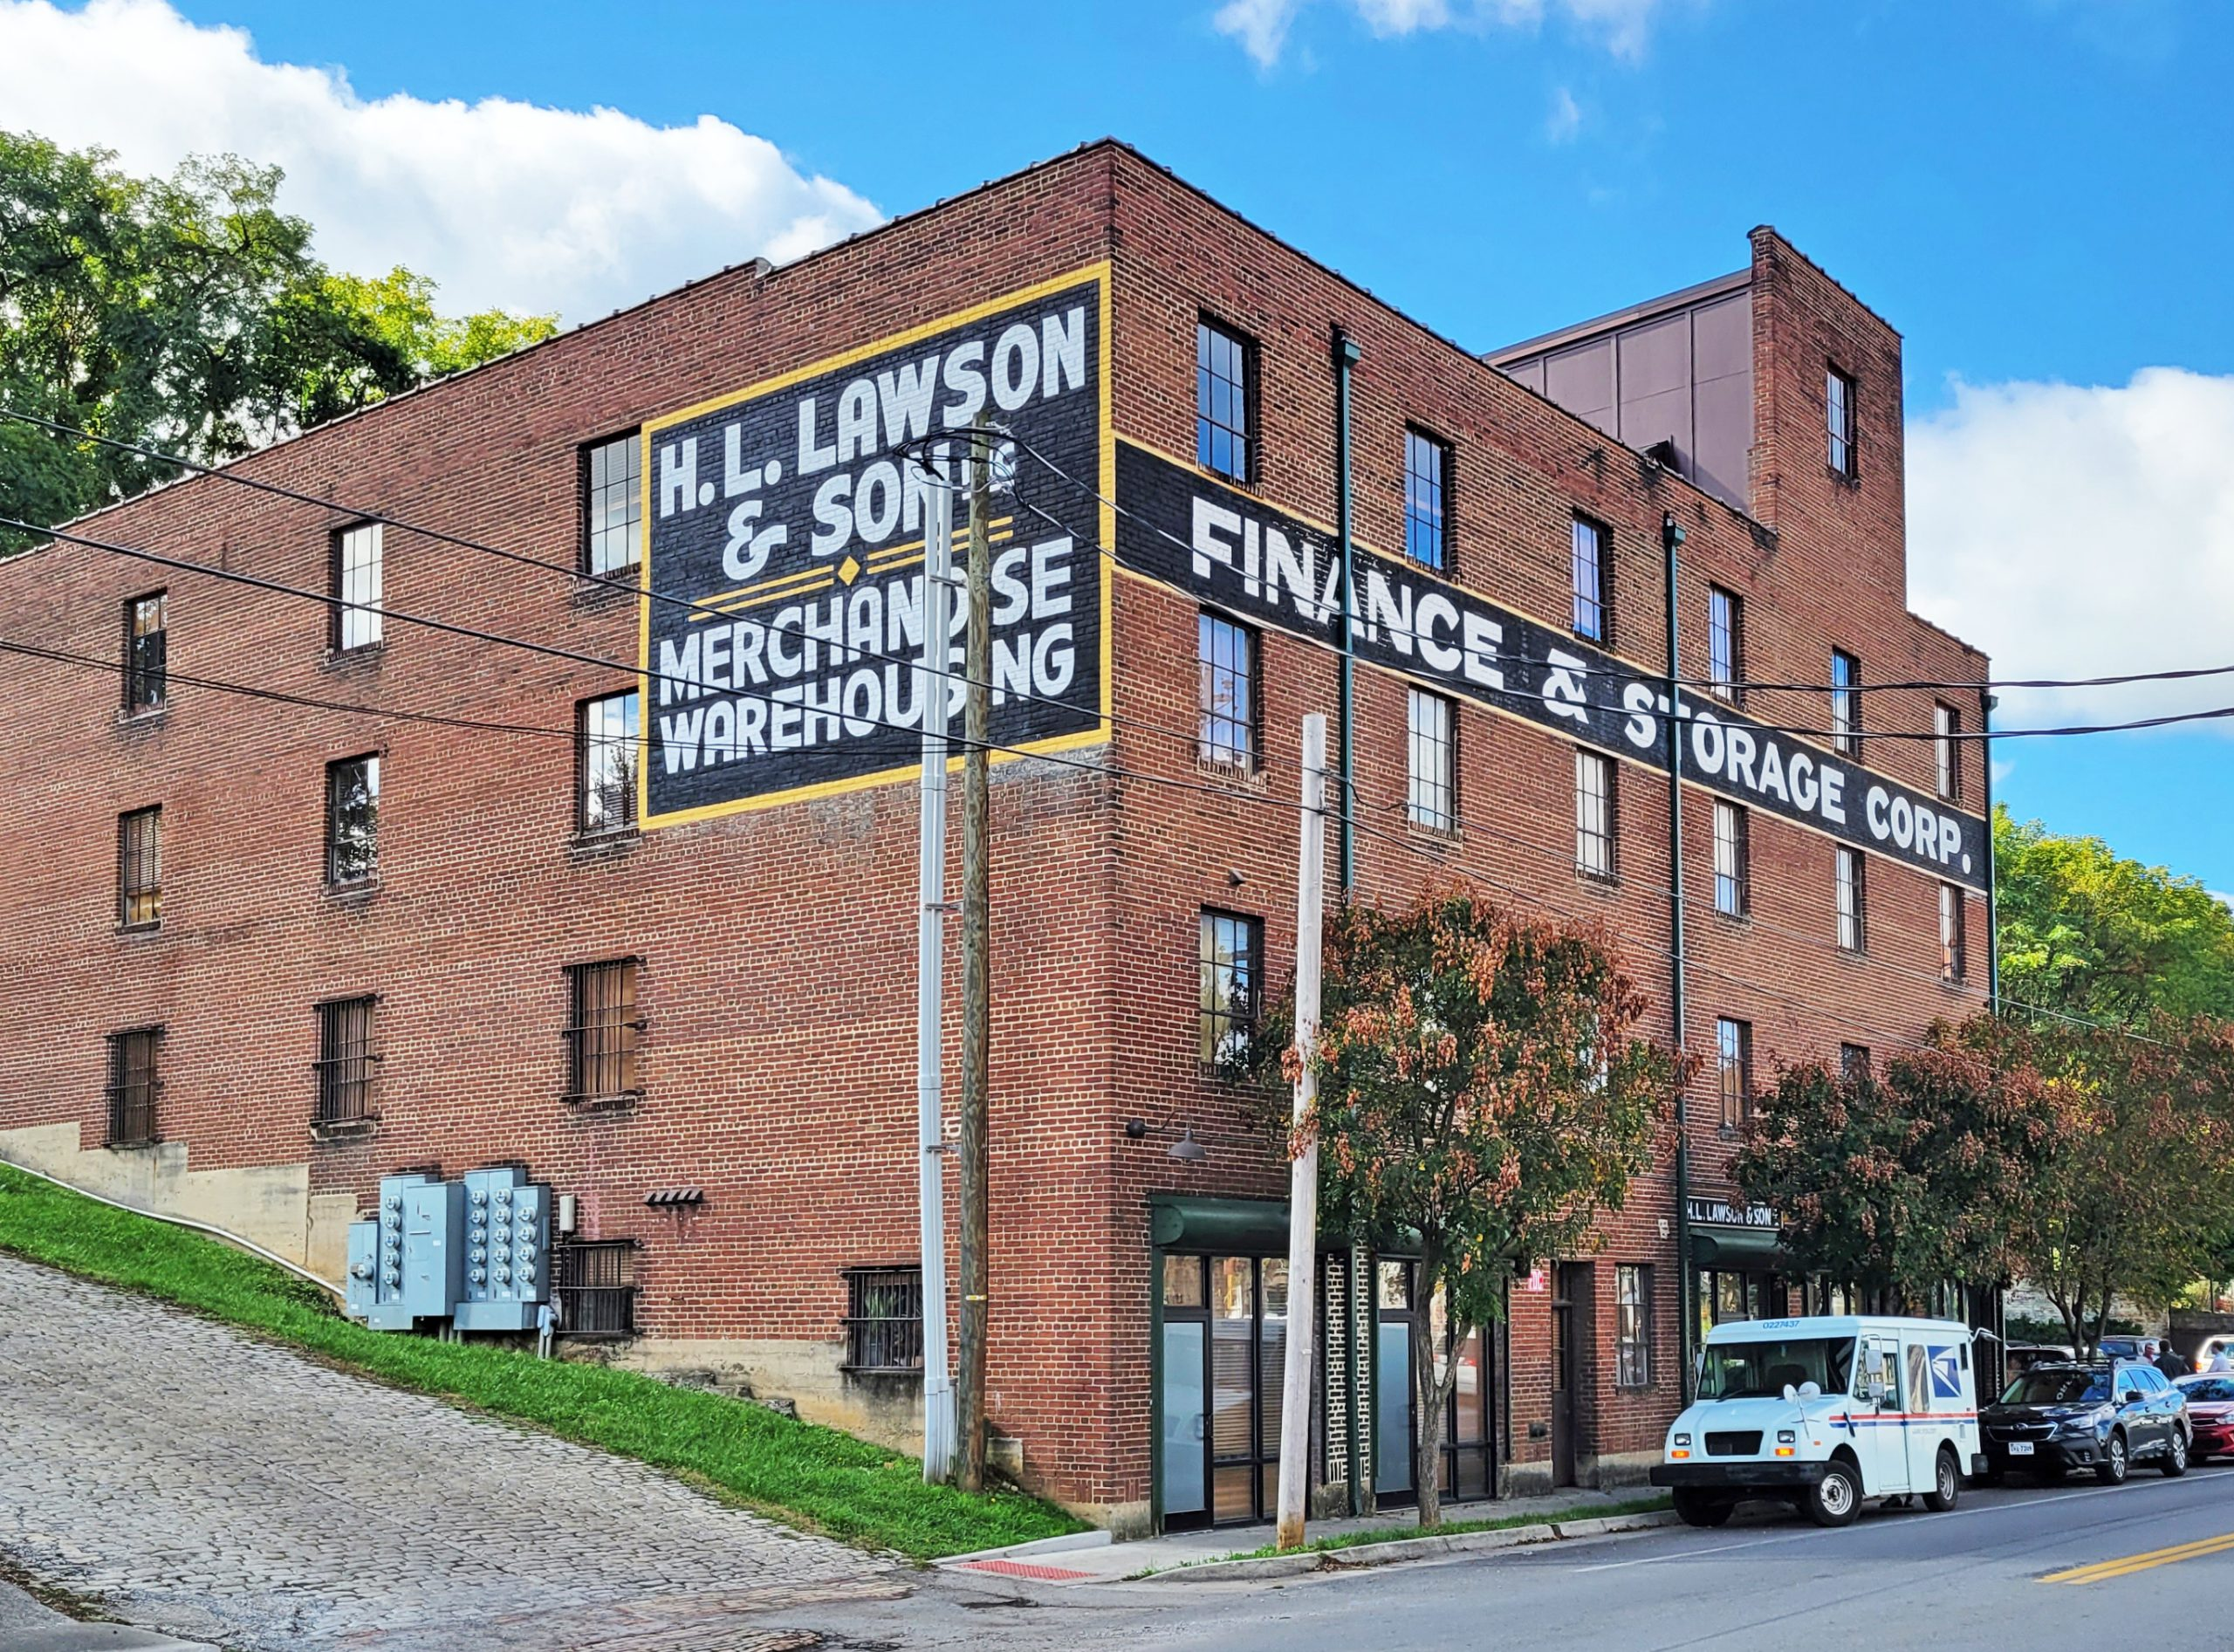 H.L. Lawson & Son Warehouse